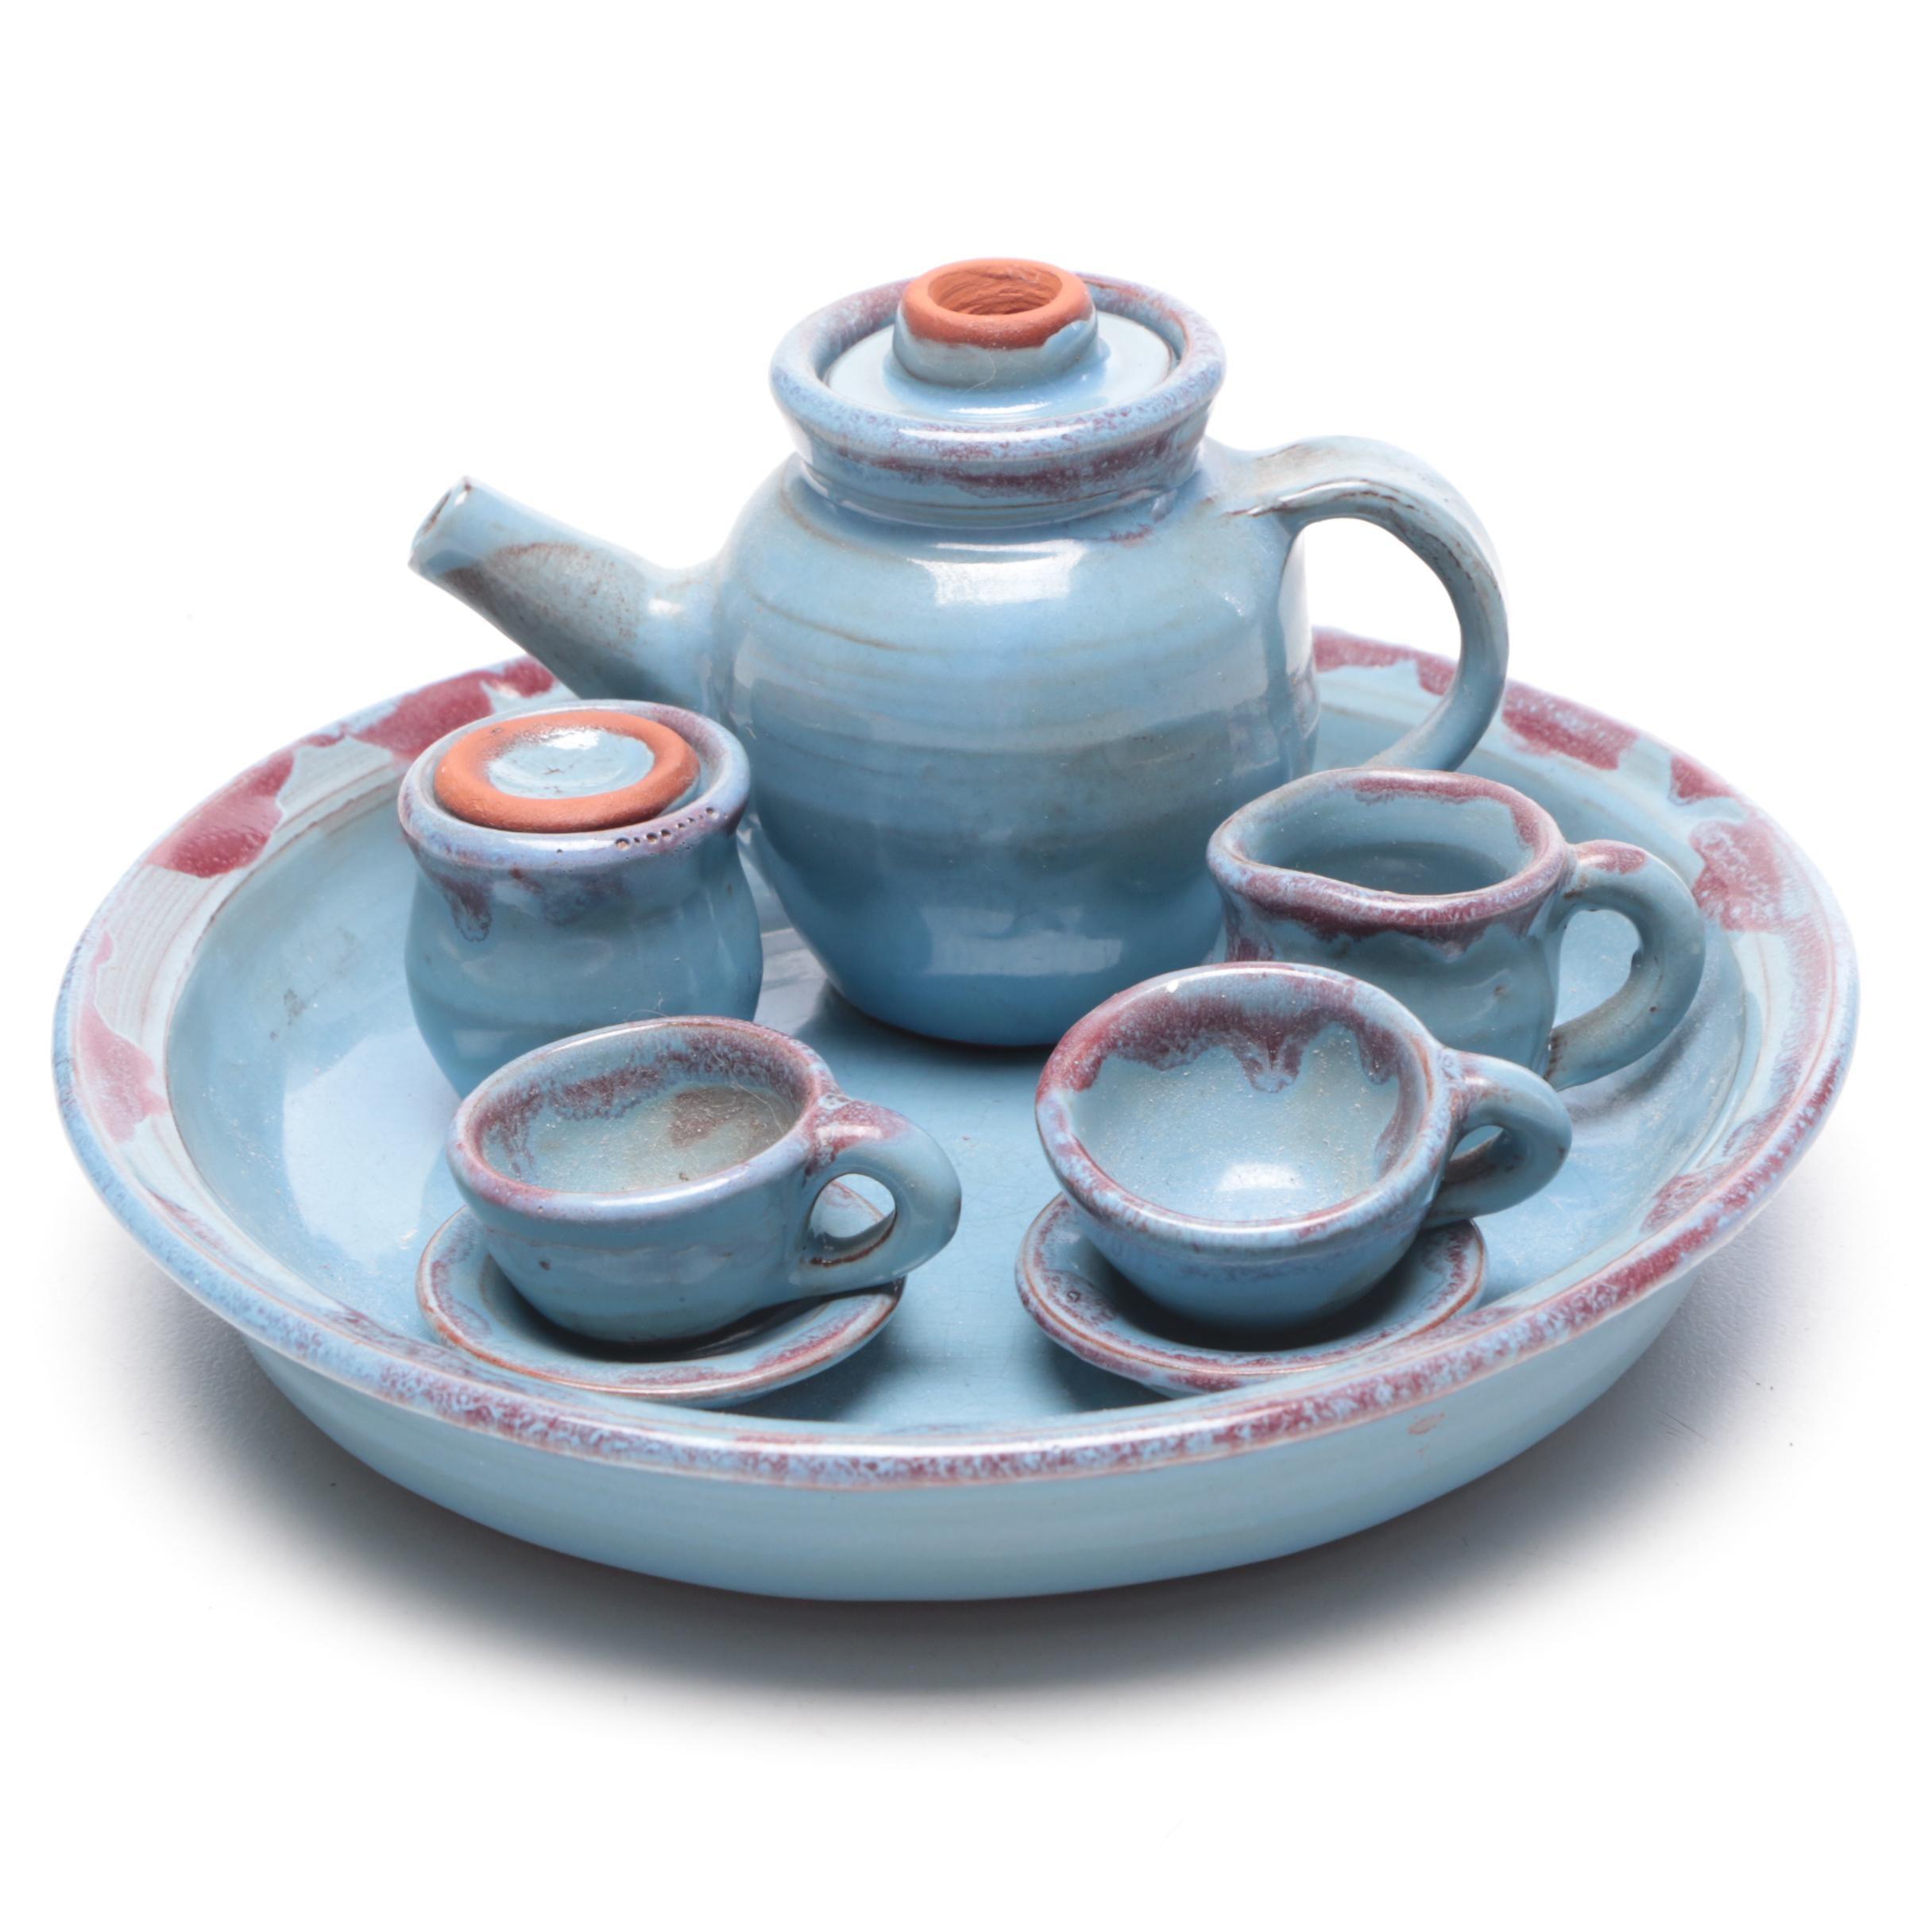 Milford Pottery Cathy Gatch Miniature Stoneware Tea Set